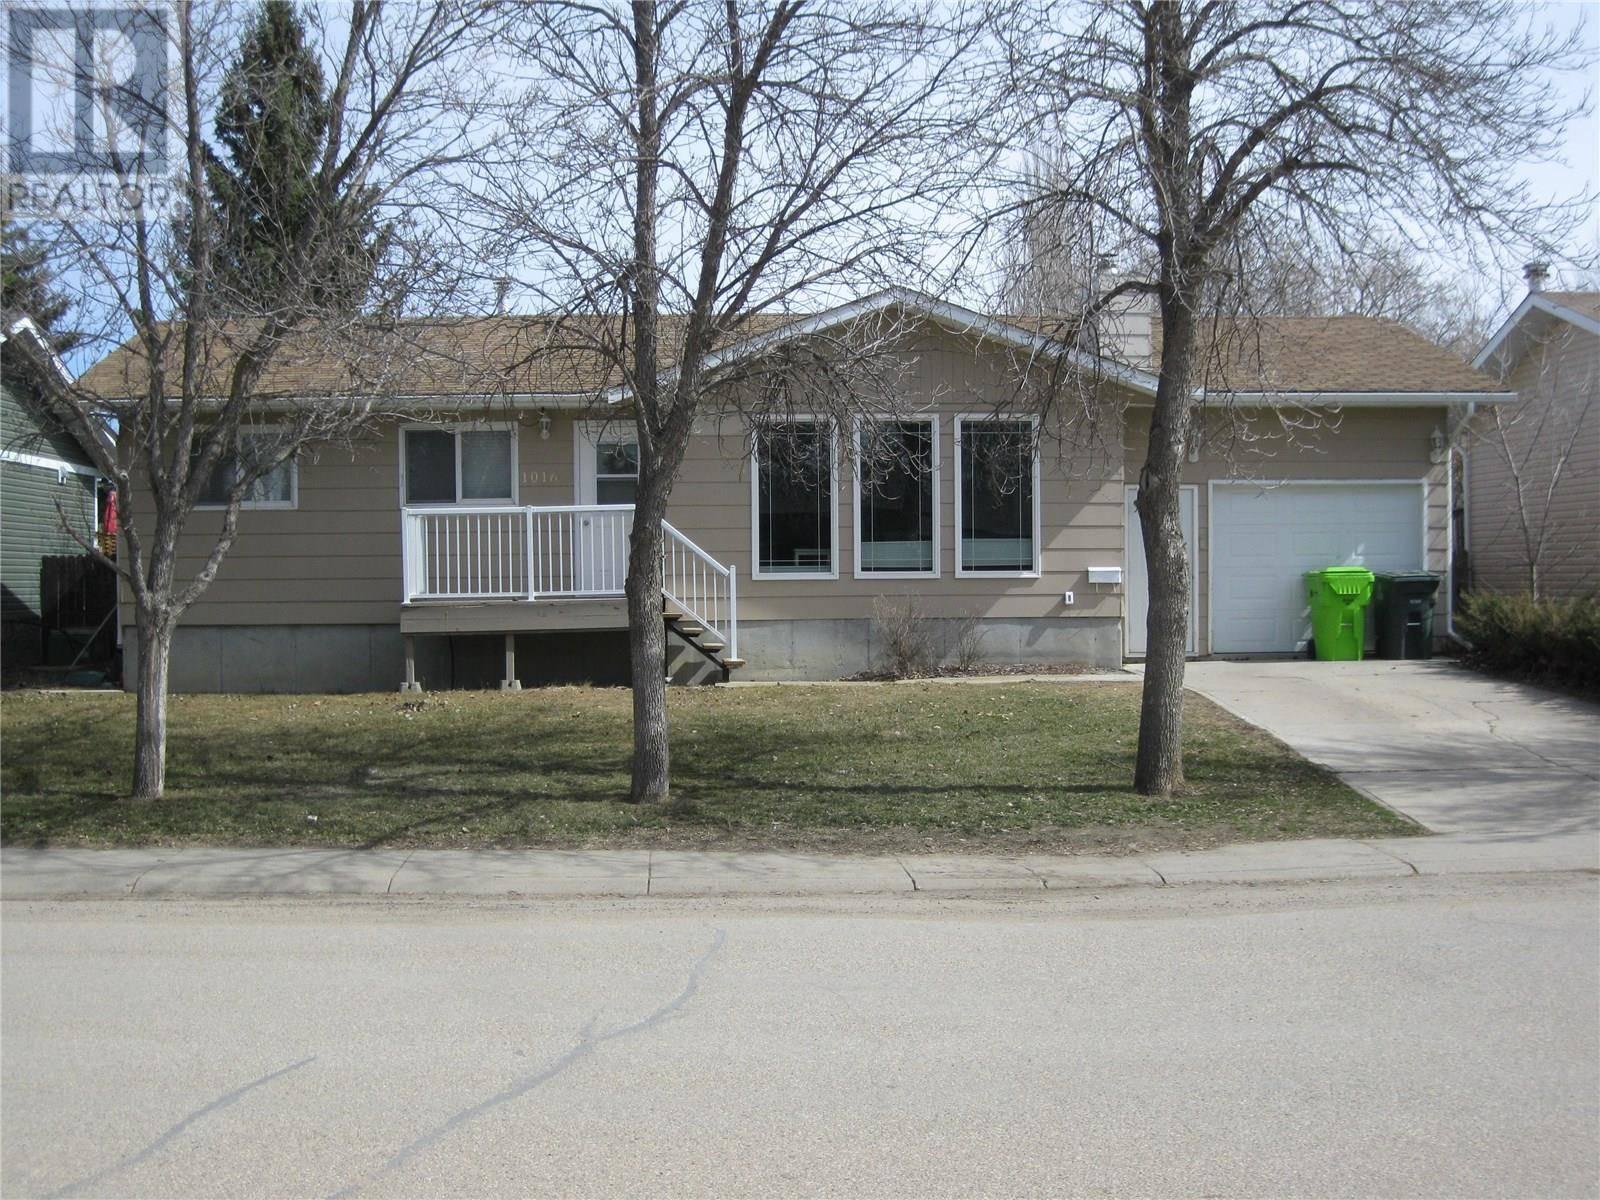 House for sale at 1016 6th St E Rosetown Saskatchewan - MLS: SK771522